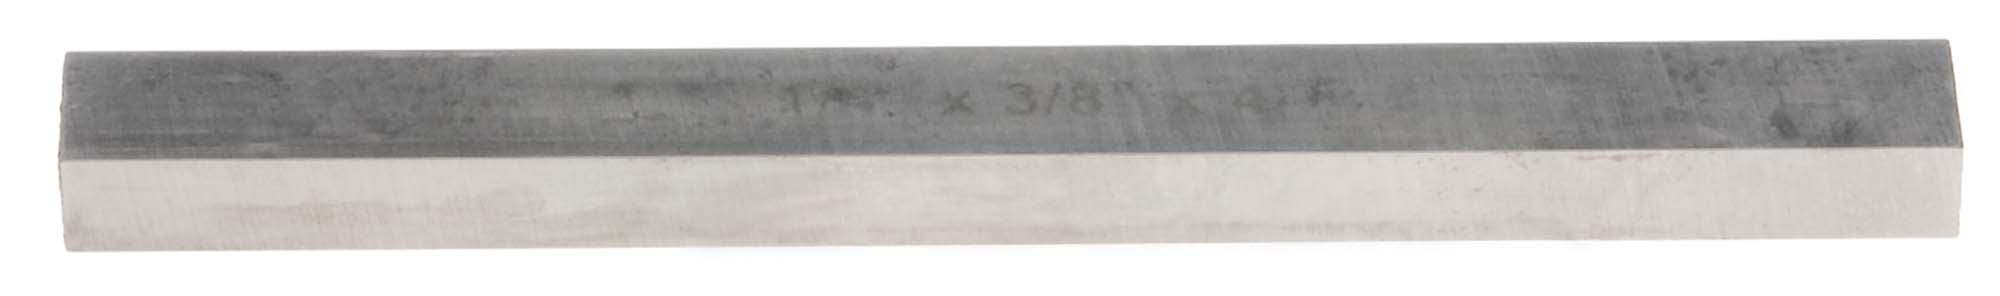 "5/16"" Square X 6"" Long 5% Cobalt Tool Bit"